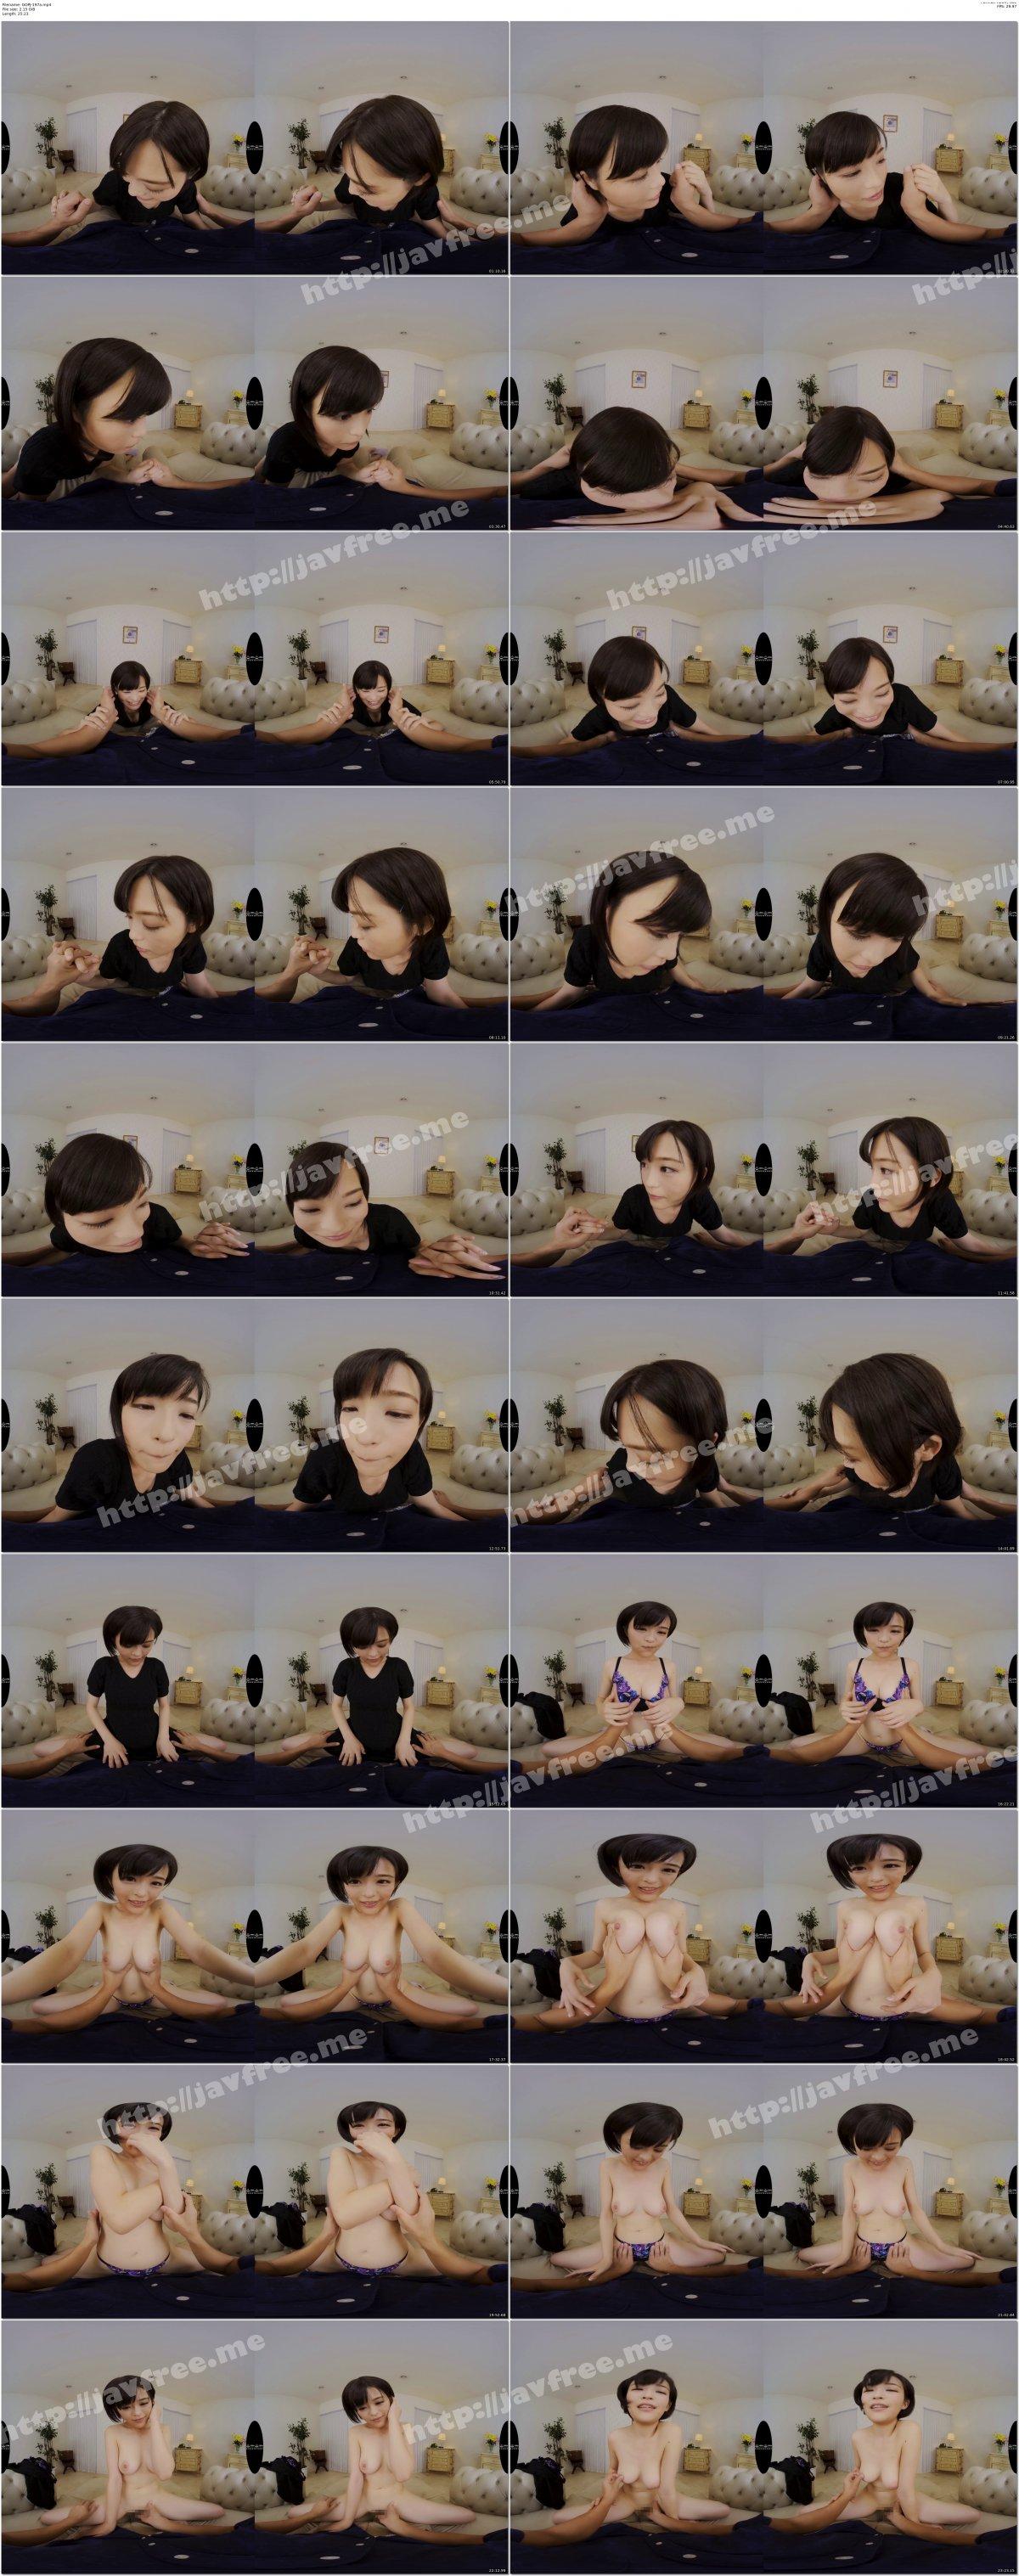 [GOPJ-197] 【VR】劇的高画質 神美乳 Hカップ 見つめ合いイチャイチャSEX 絶頂11回! 風野のん - image GOPJ-197a on https://javfree.me